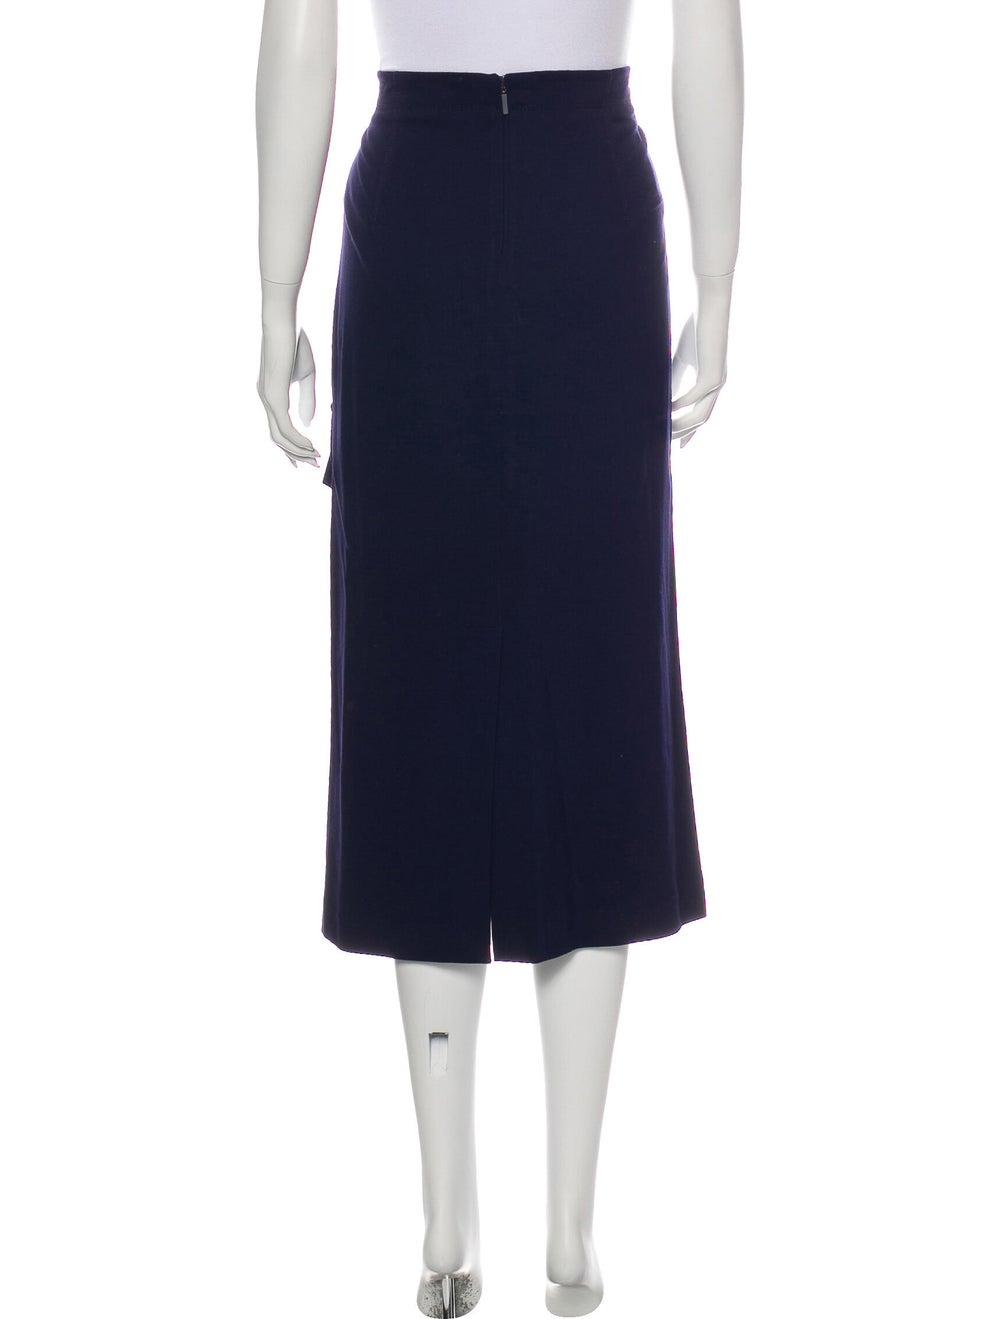 Tibi Ruffle Embellishment Midi Length Skirt Blue - image 3